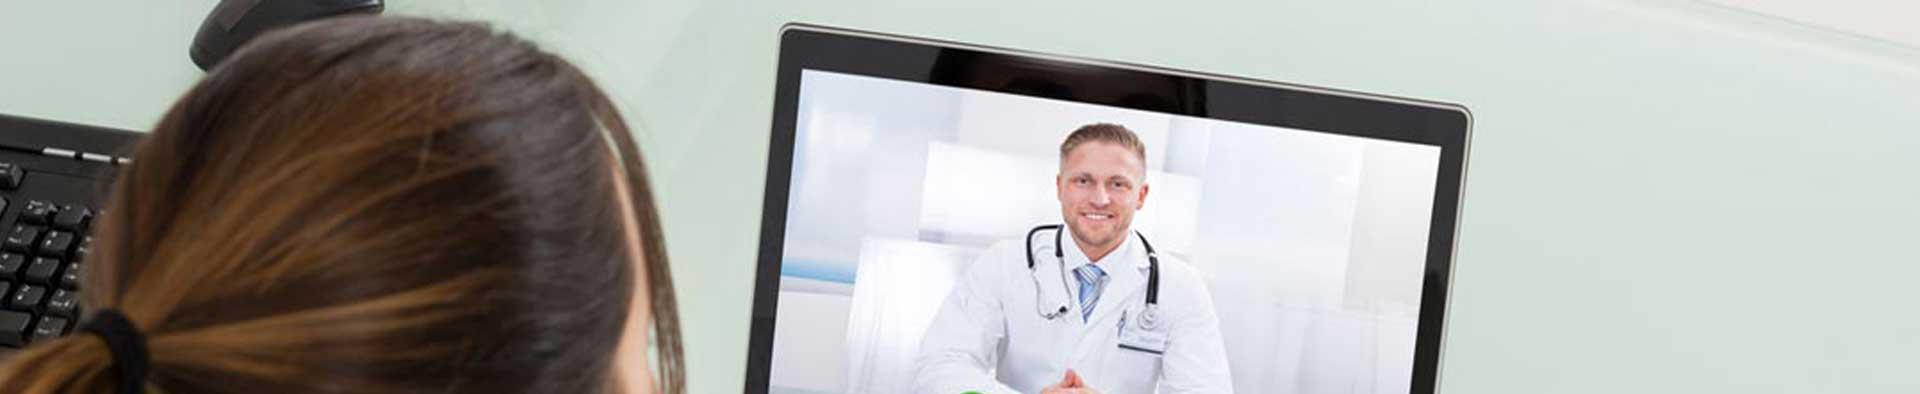 Sistema de agendamento online con Videochamada integrada